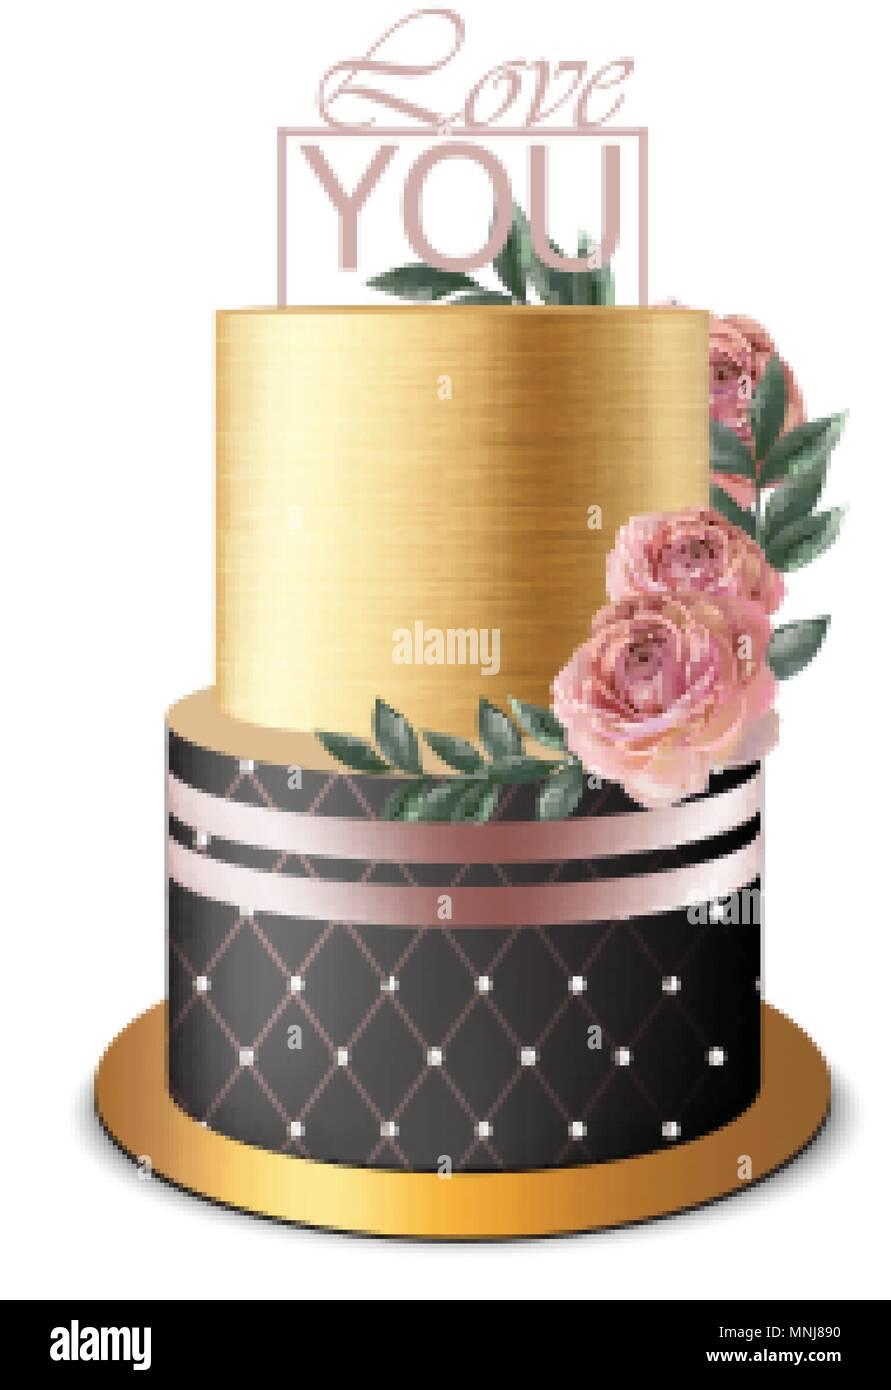 Swell Luxury Gold Cake Vector Realistic Birthday Anniversary Wedding Funny Birthday Cards Online Necthendildamsfinfo